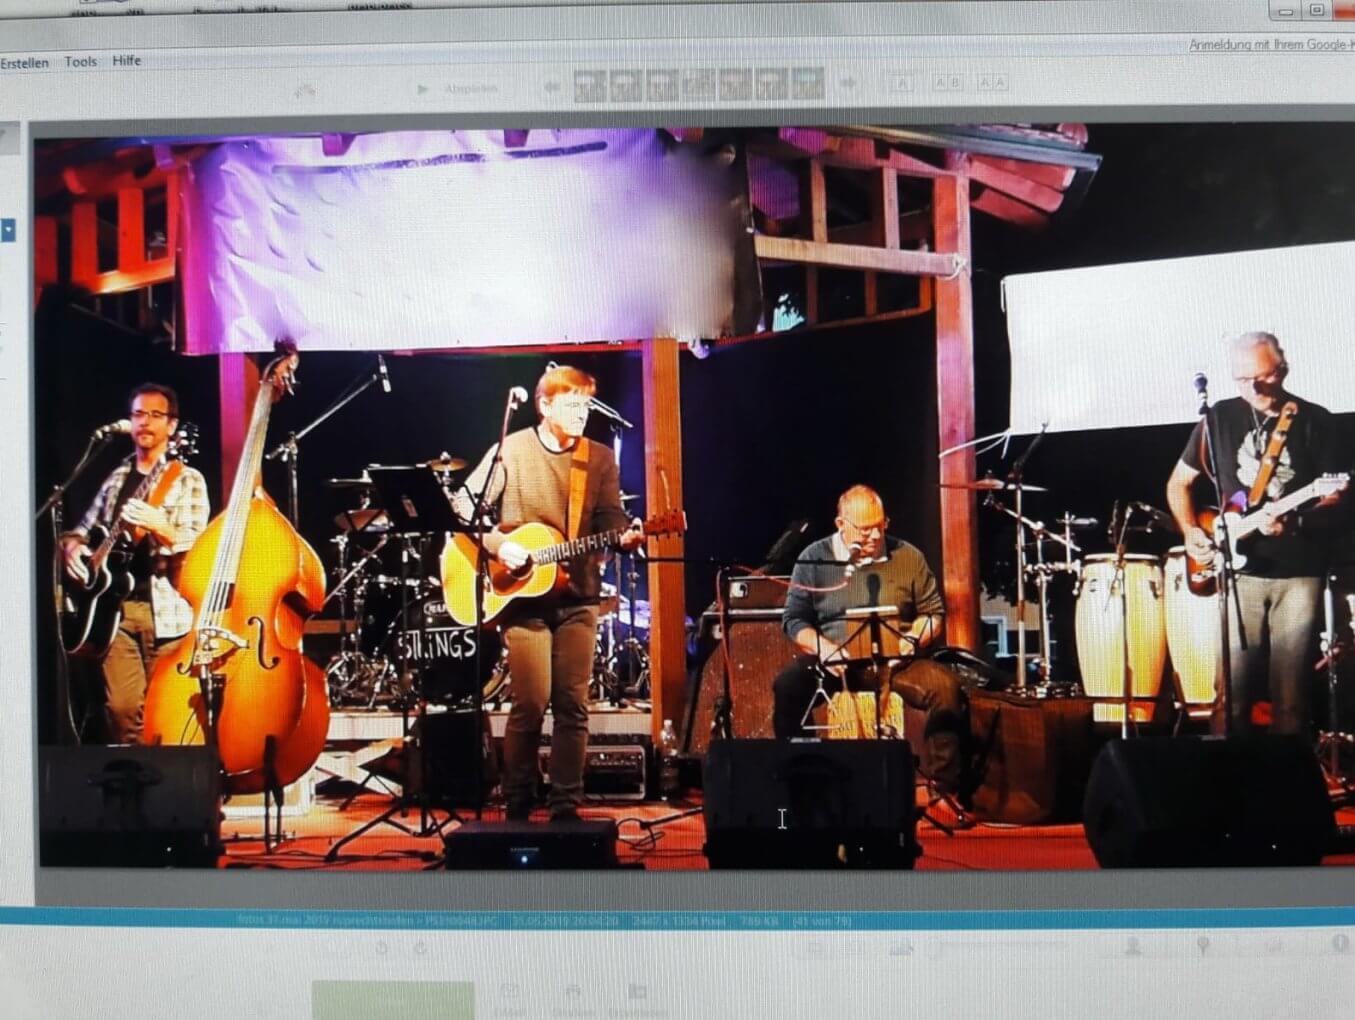 Live Musik - Samstag 08. August 20